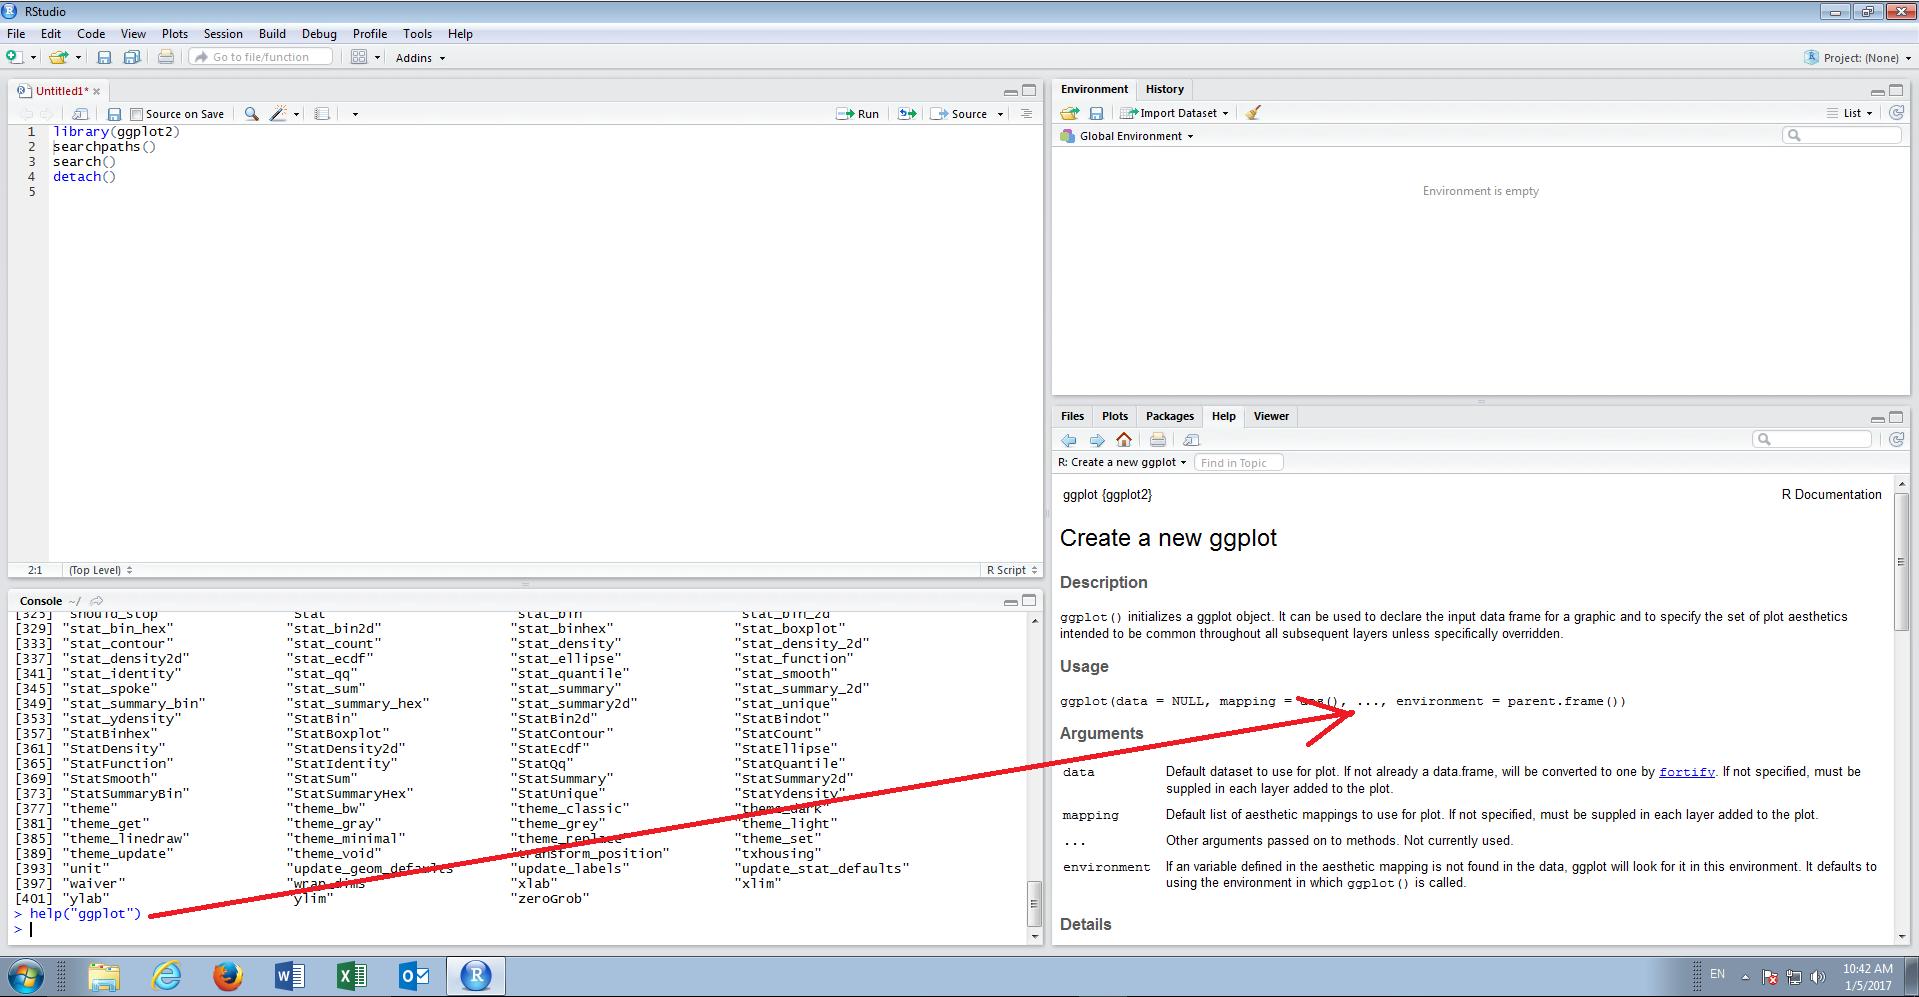 ggplot2-help-written-out-to-rstudio-help-window.png